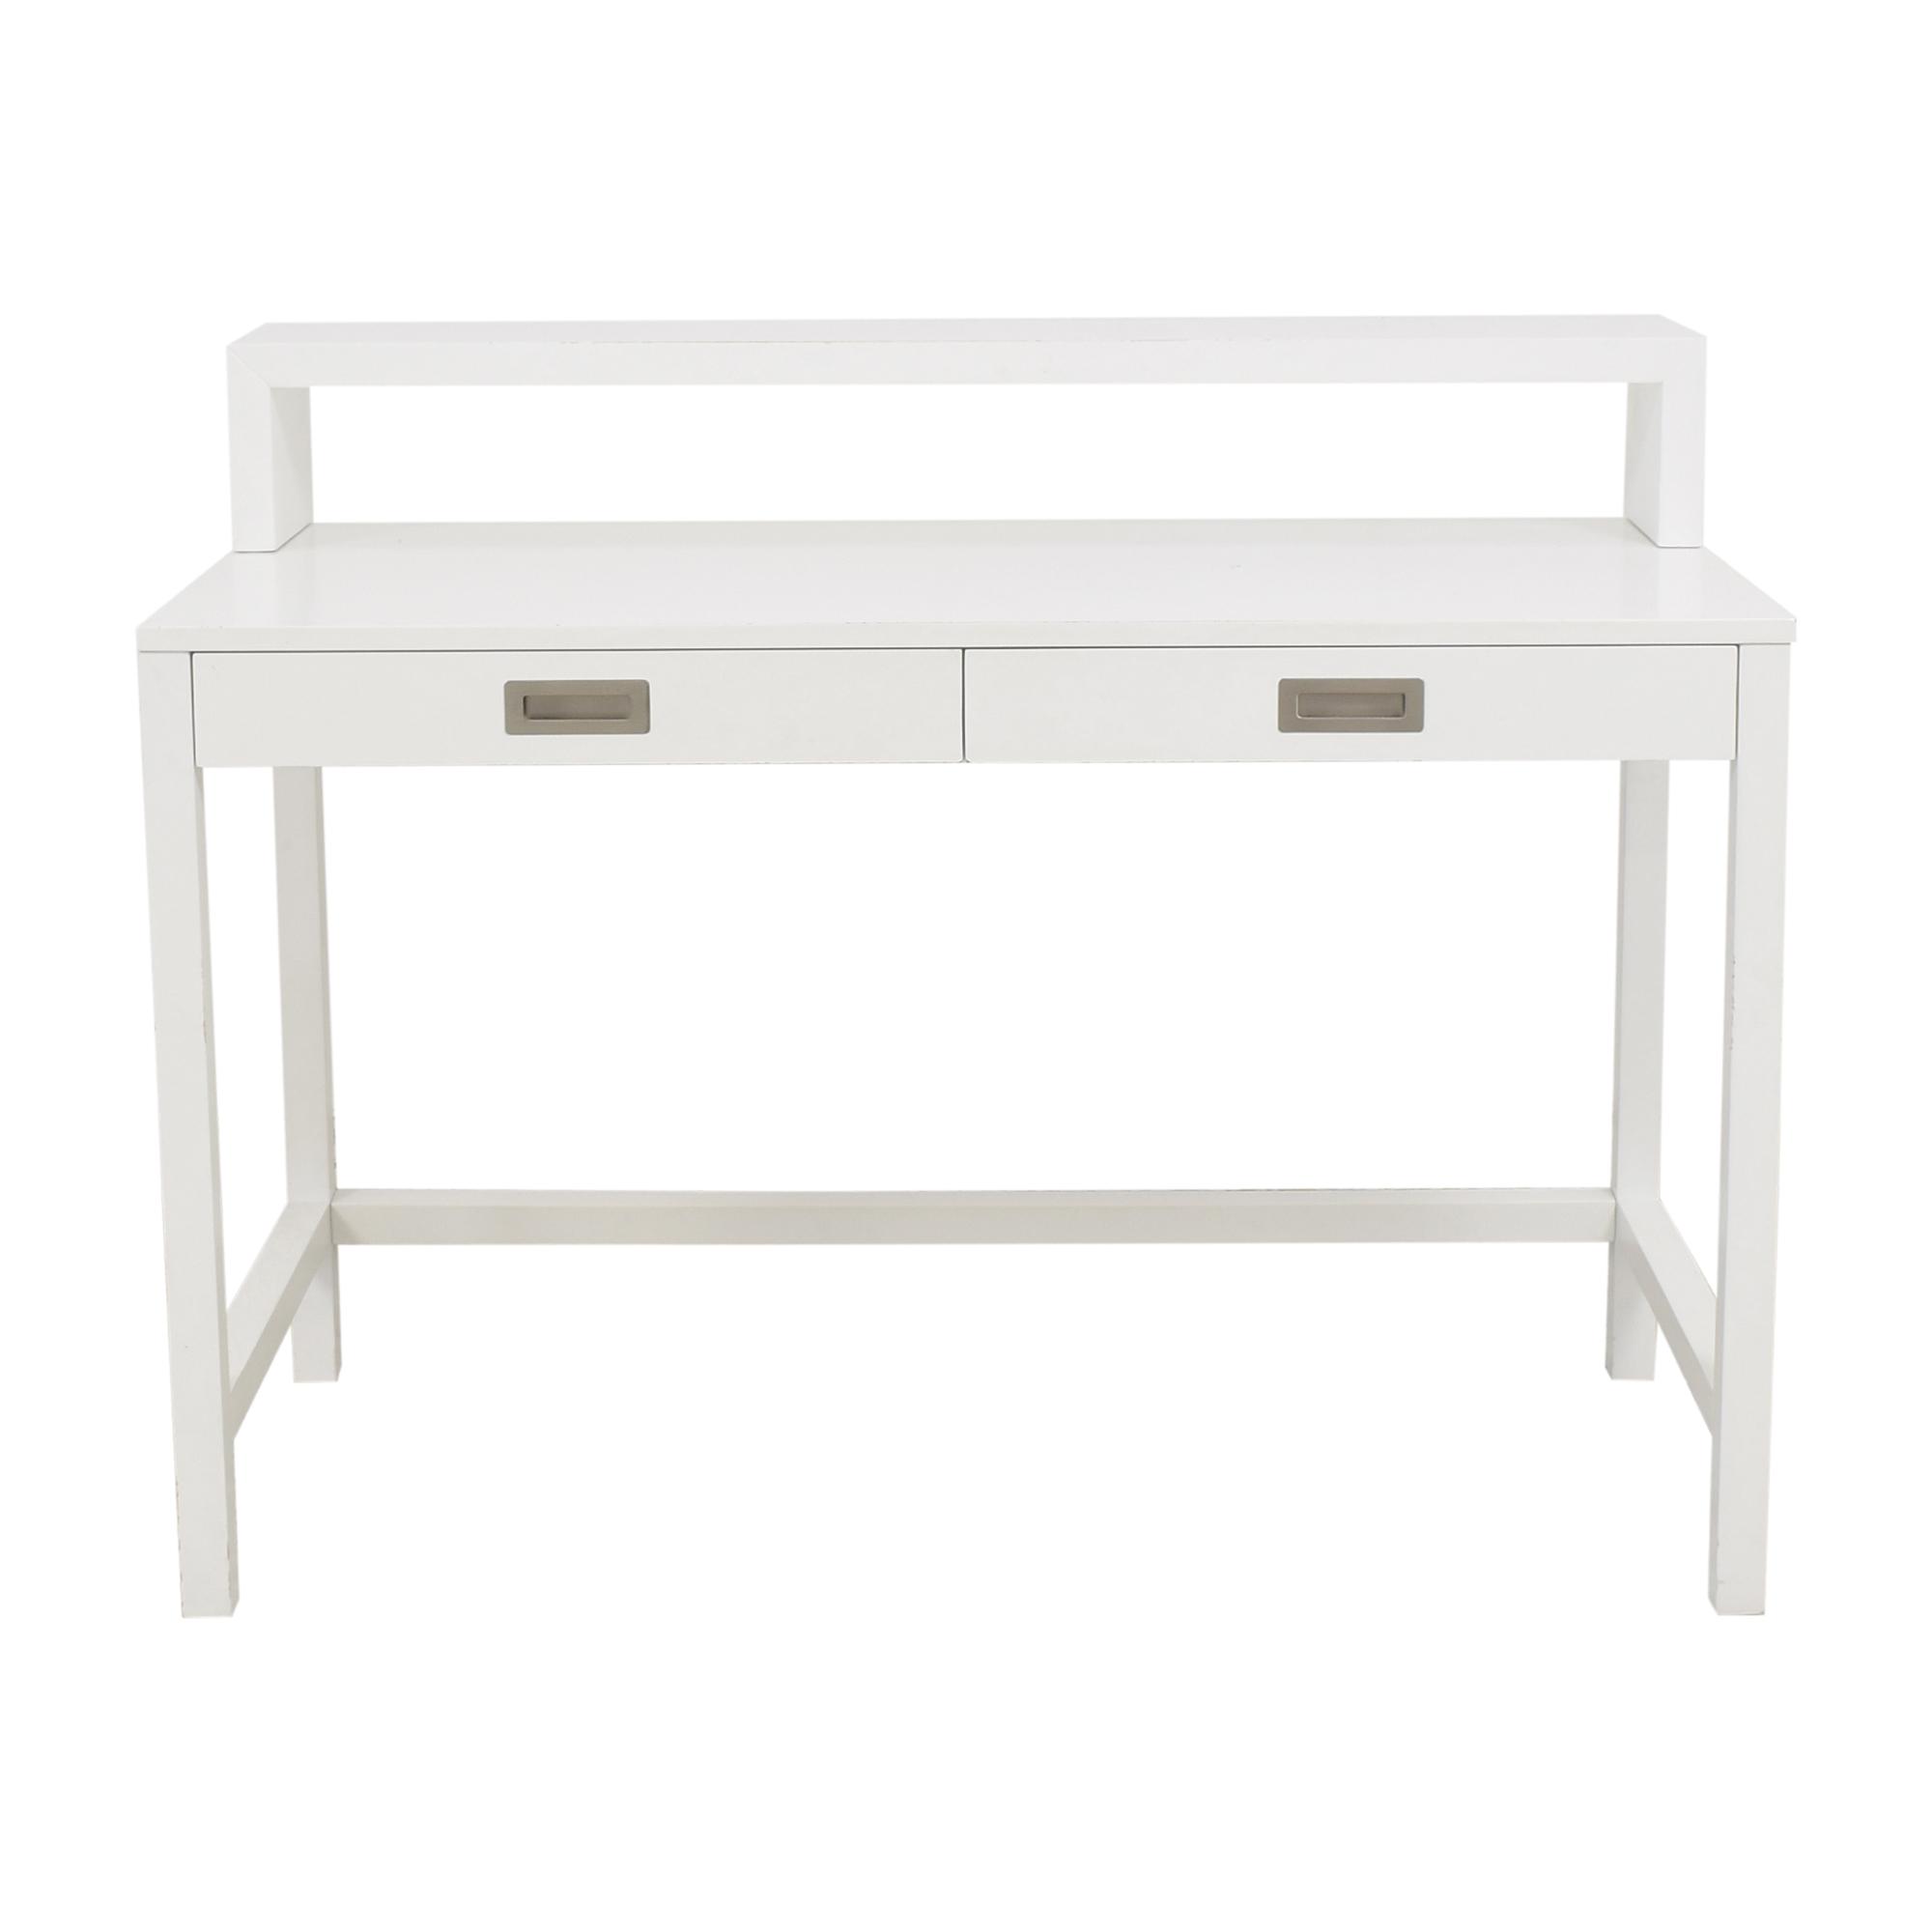 Crate & Barrel Crate & Barrel Aspect Desk with Hutch on sale